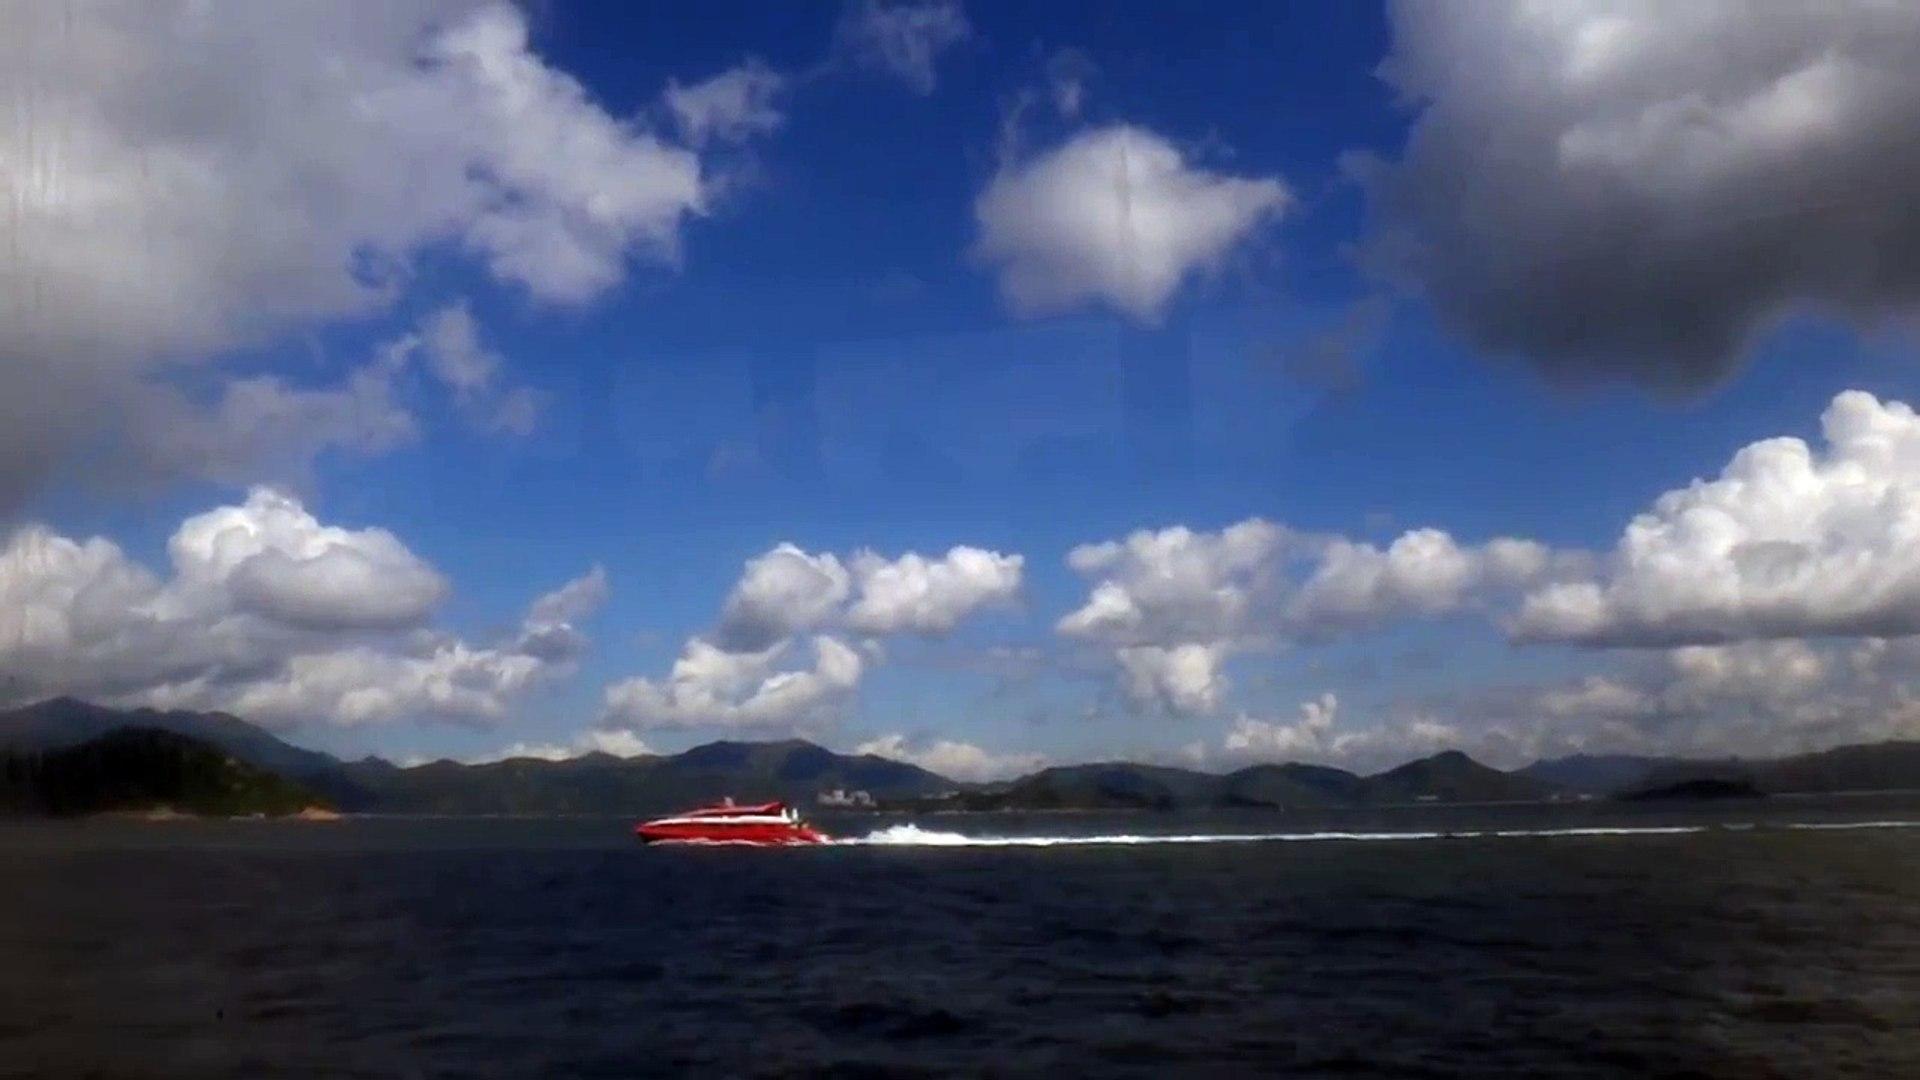 噴射飛航 Jetfoil 金星 (Santa Maria) VS Tricat 宇航2006 (Universal MK 2006)